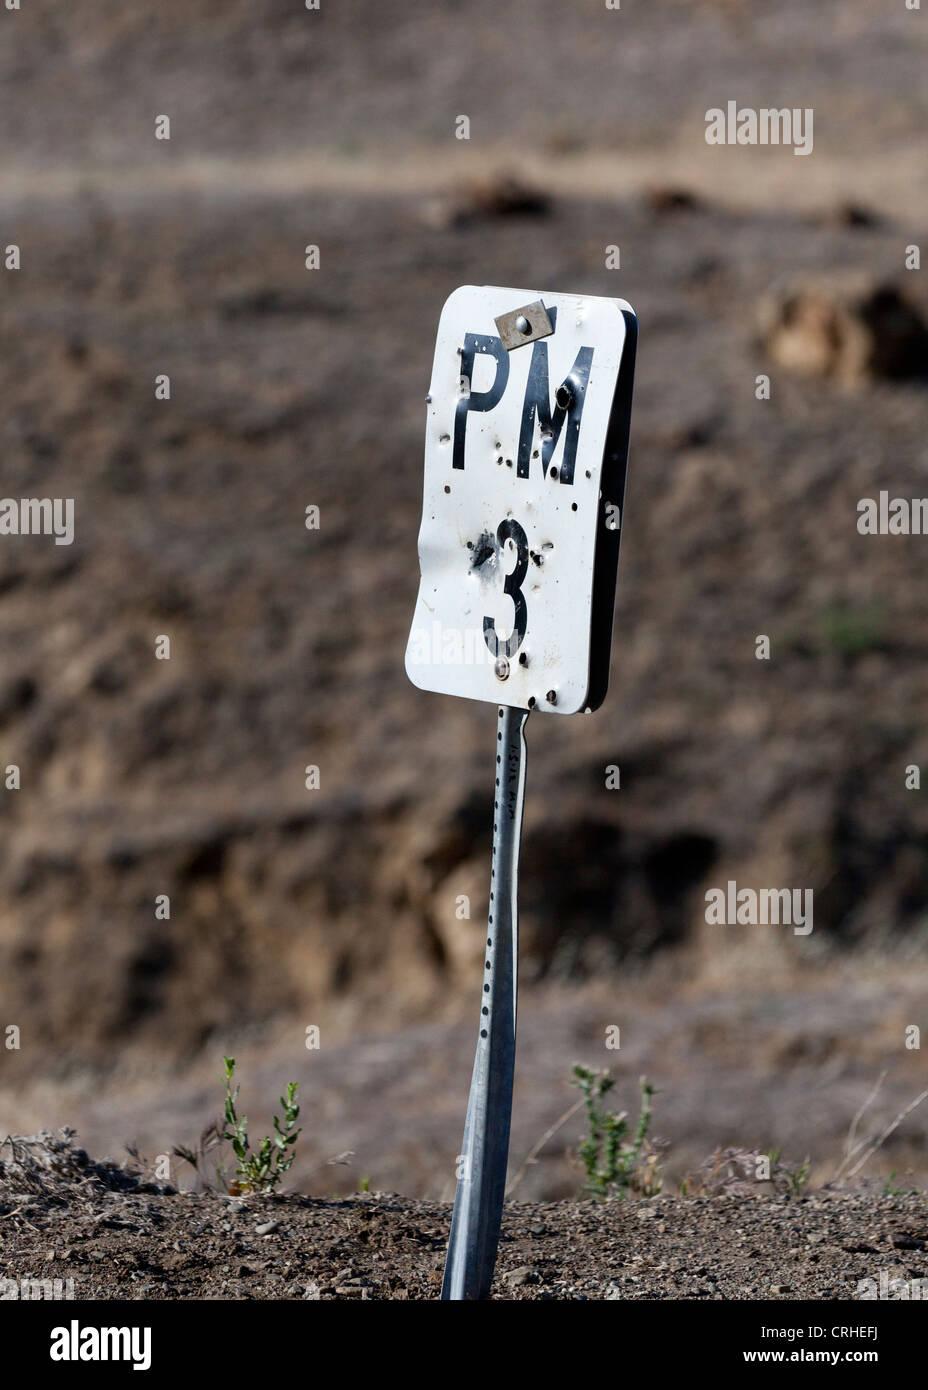 Bullet ridden road sign - Stock Image